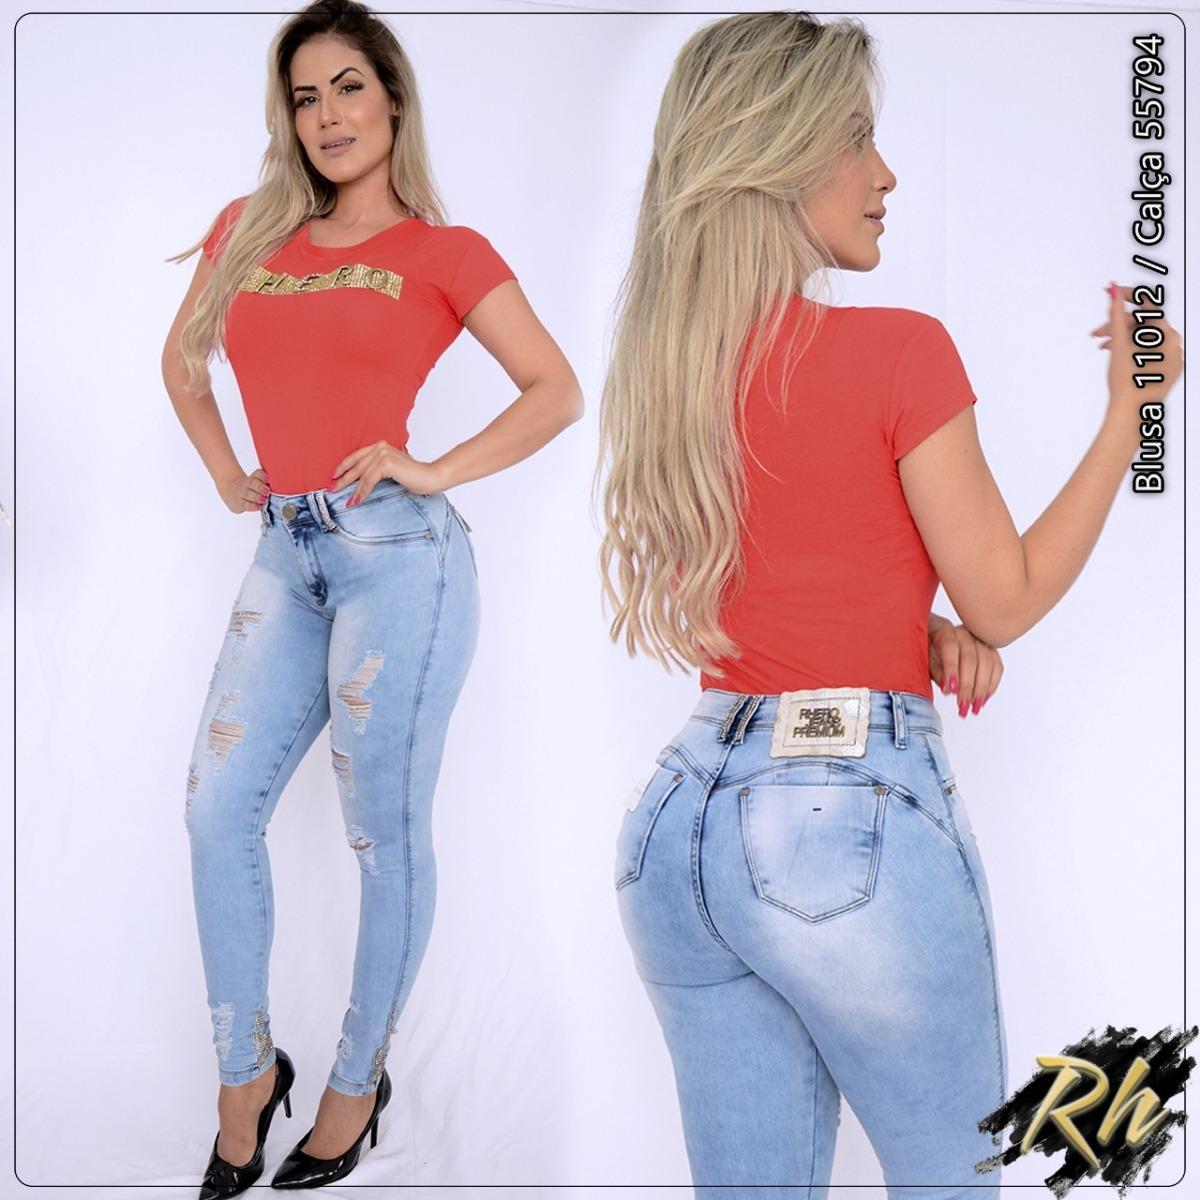 da5178020 Calça Jeans Rhero Estilo Pitbull # Rhero Ref 55794 - R$ 294,00 em ...